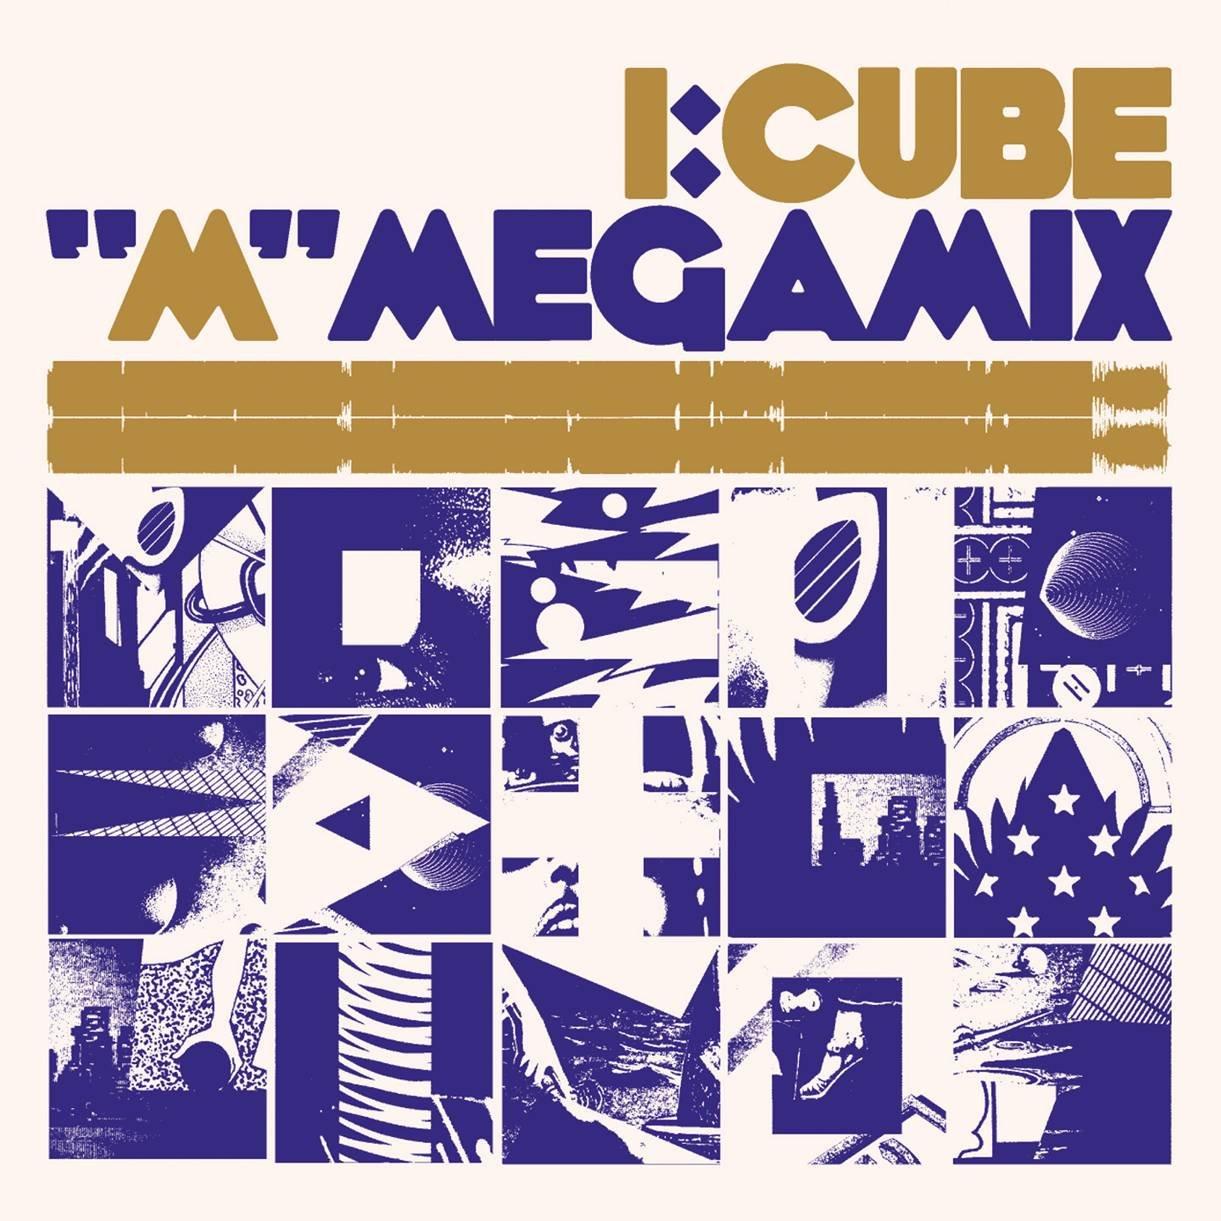 'M' megamix